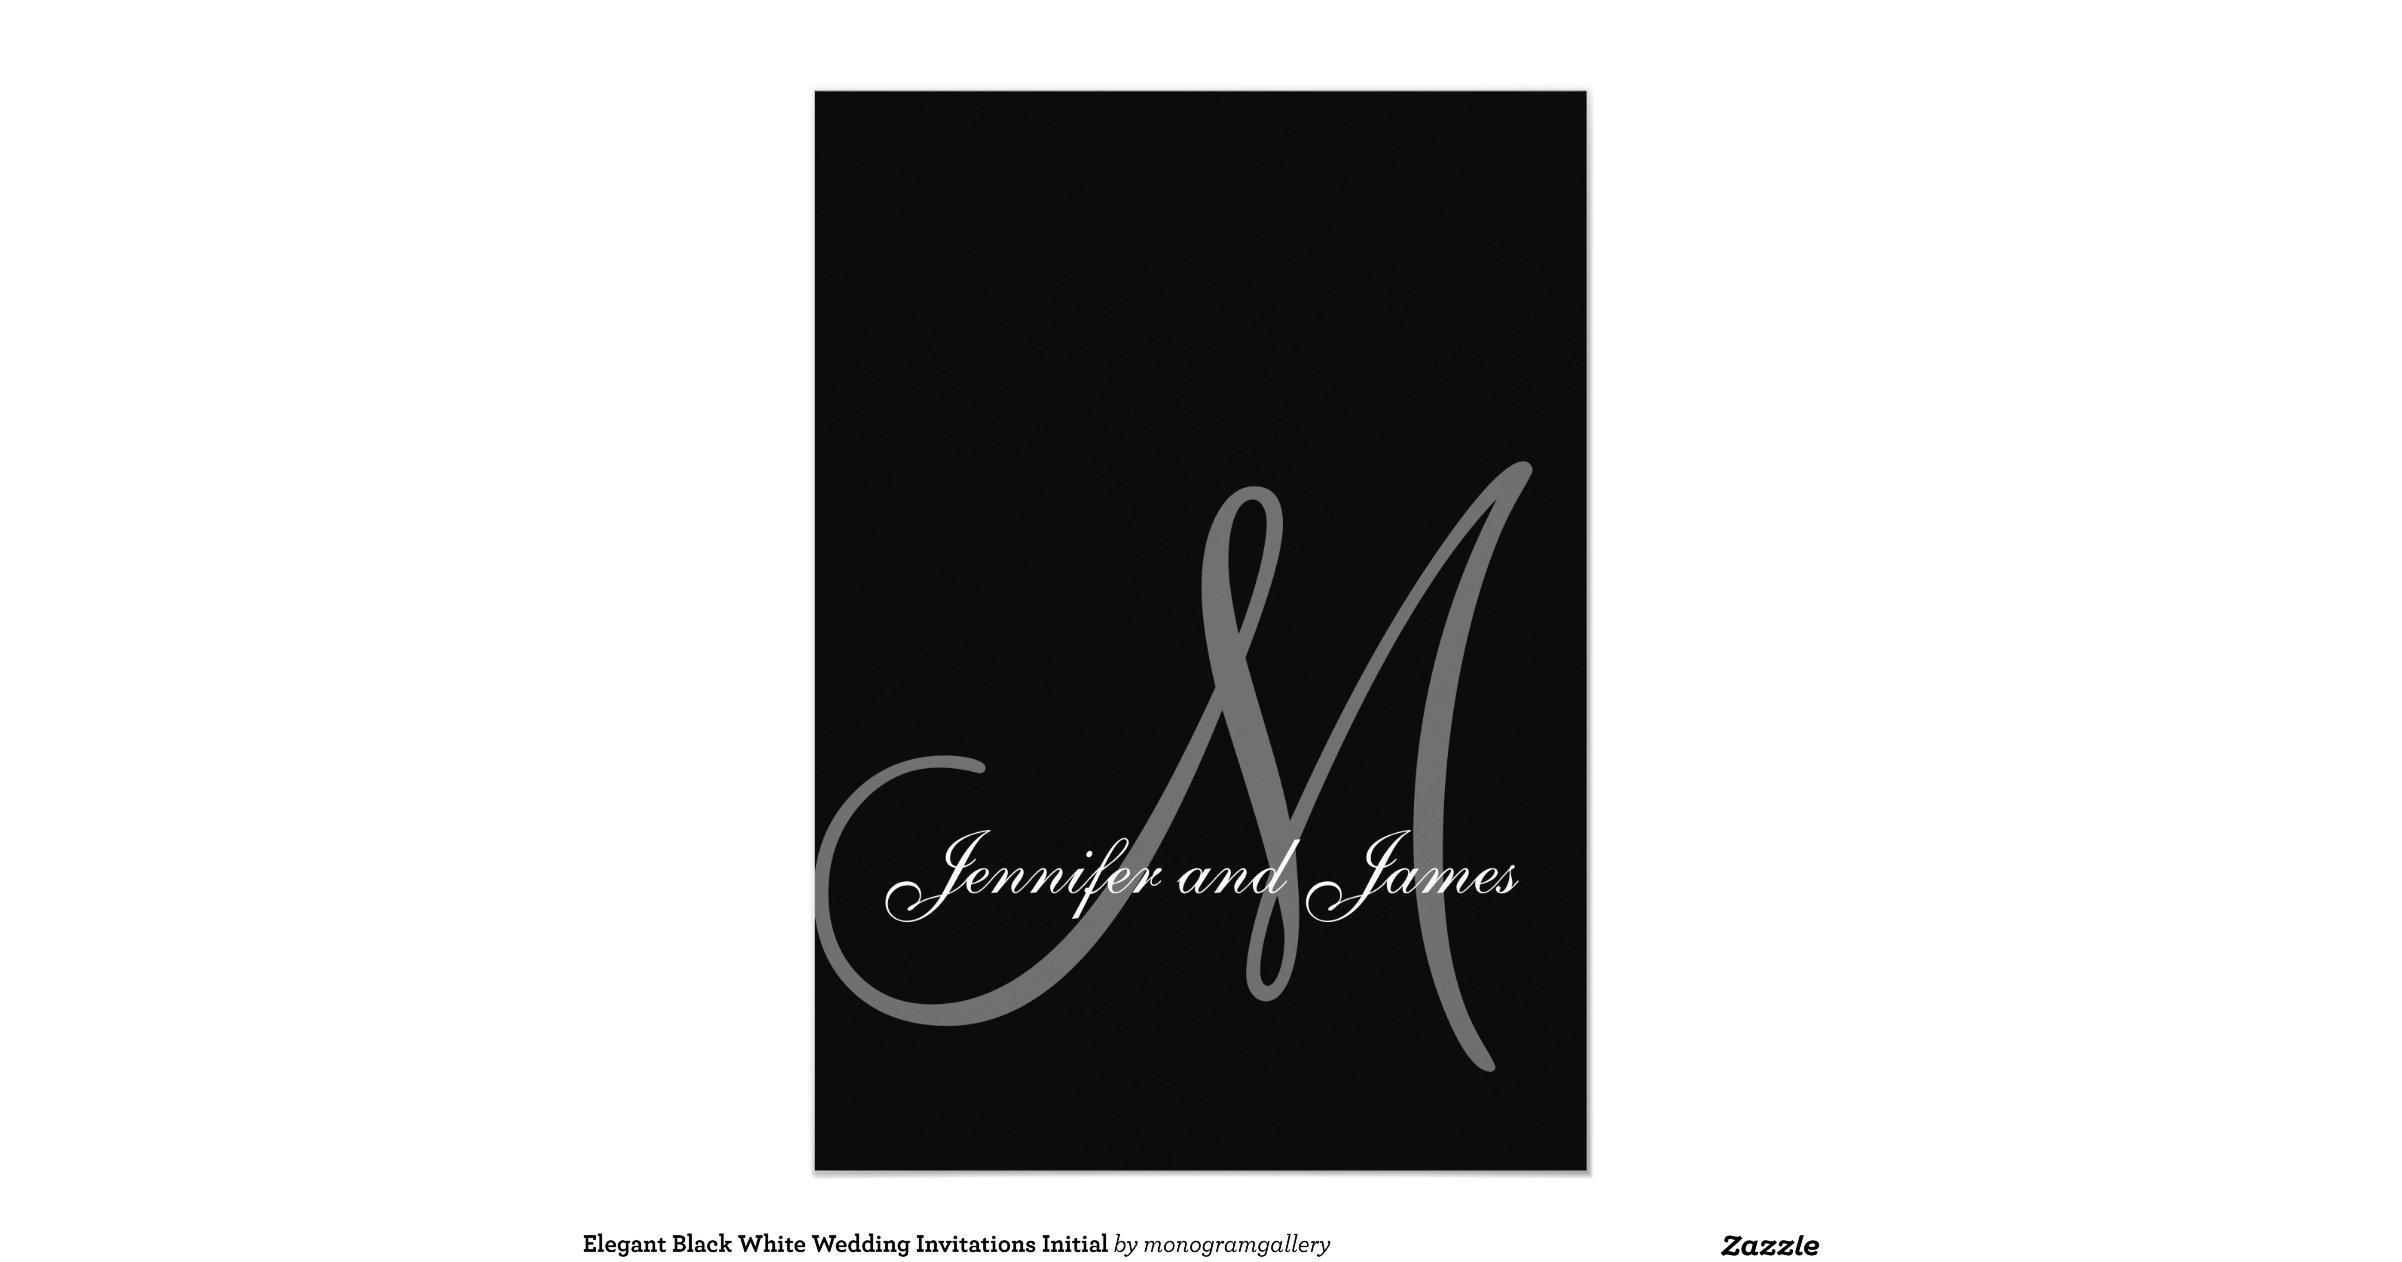 Black White Wedding Invitations: Elegant_black_white_wedding_invitations_initial